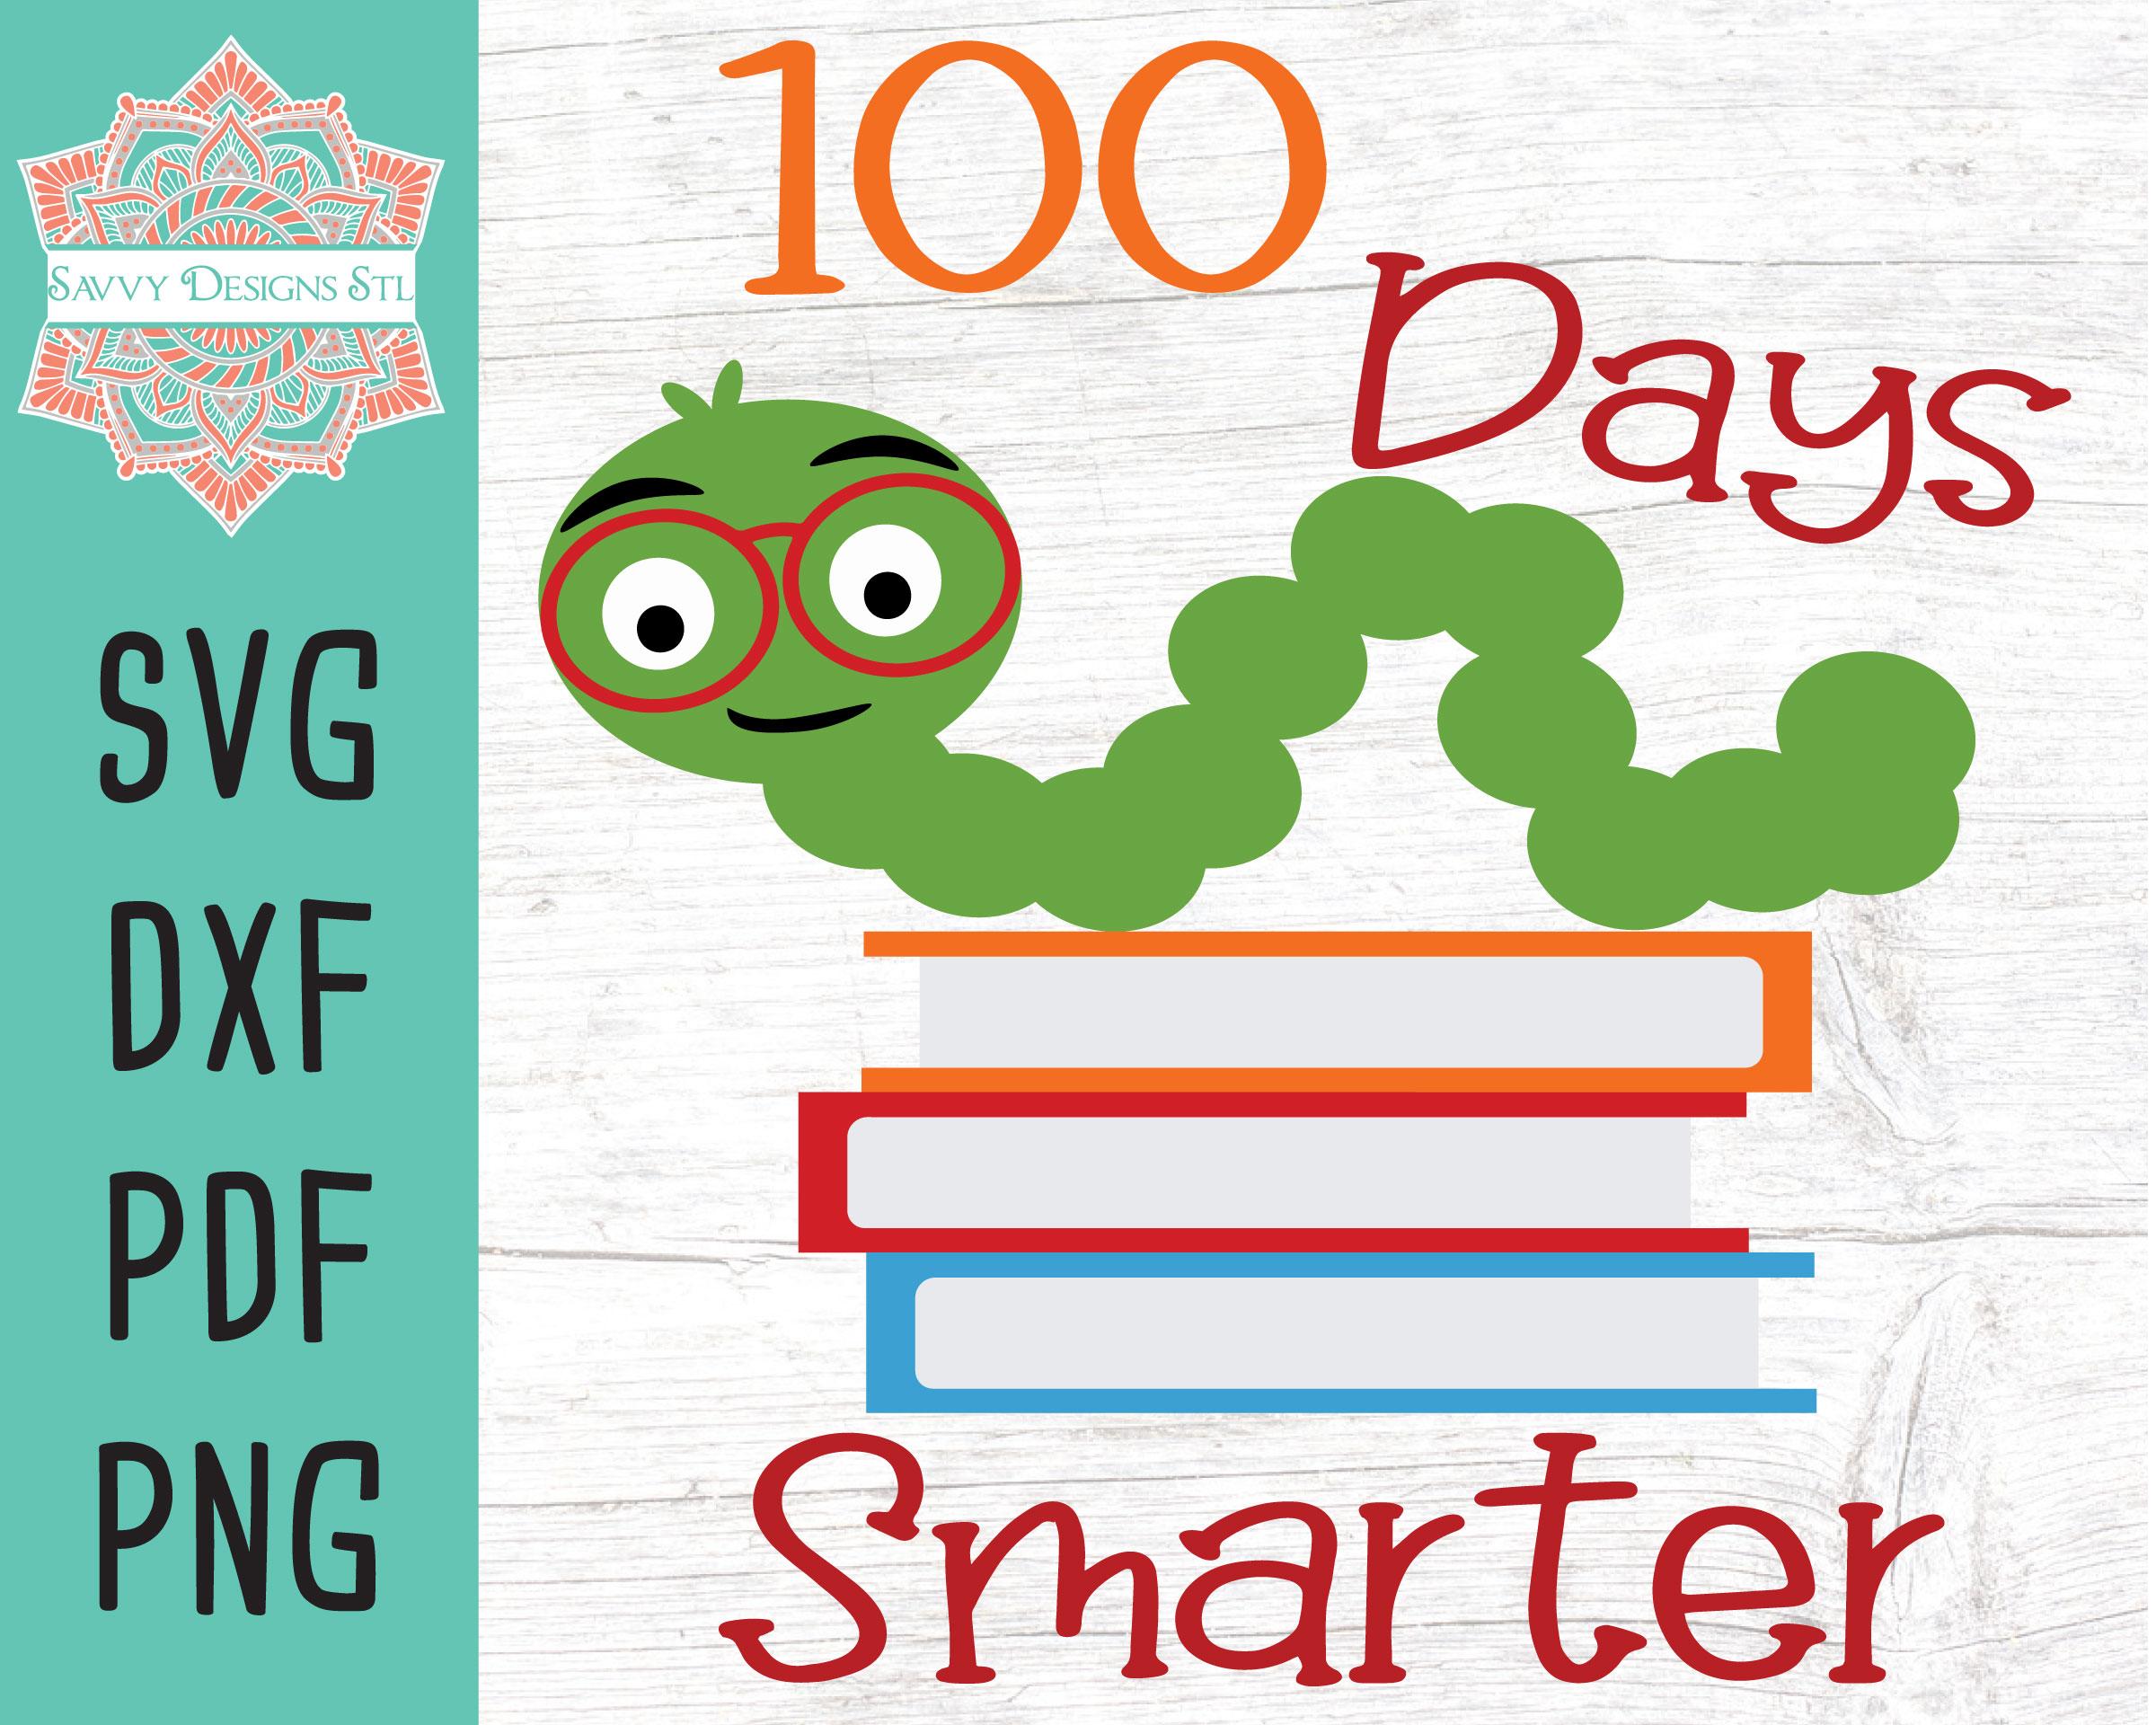 100 Days Smarter Caterpillar Cut File Savvy Designs Stl